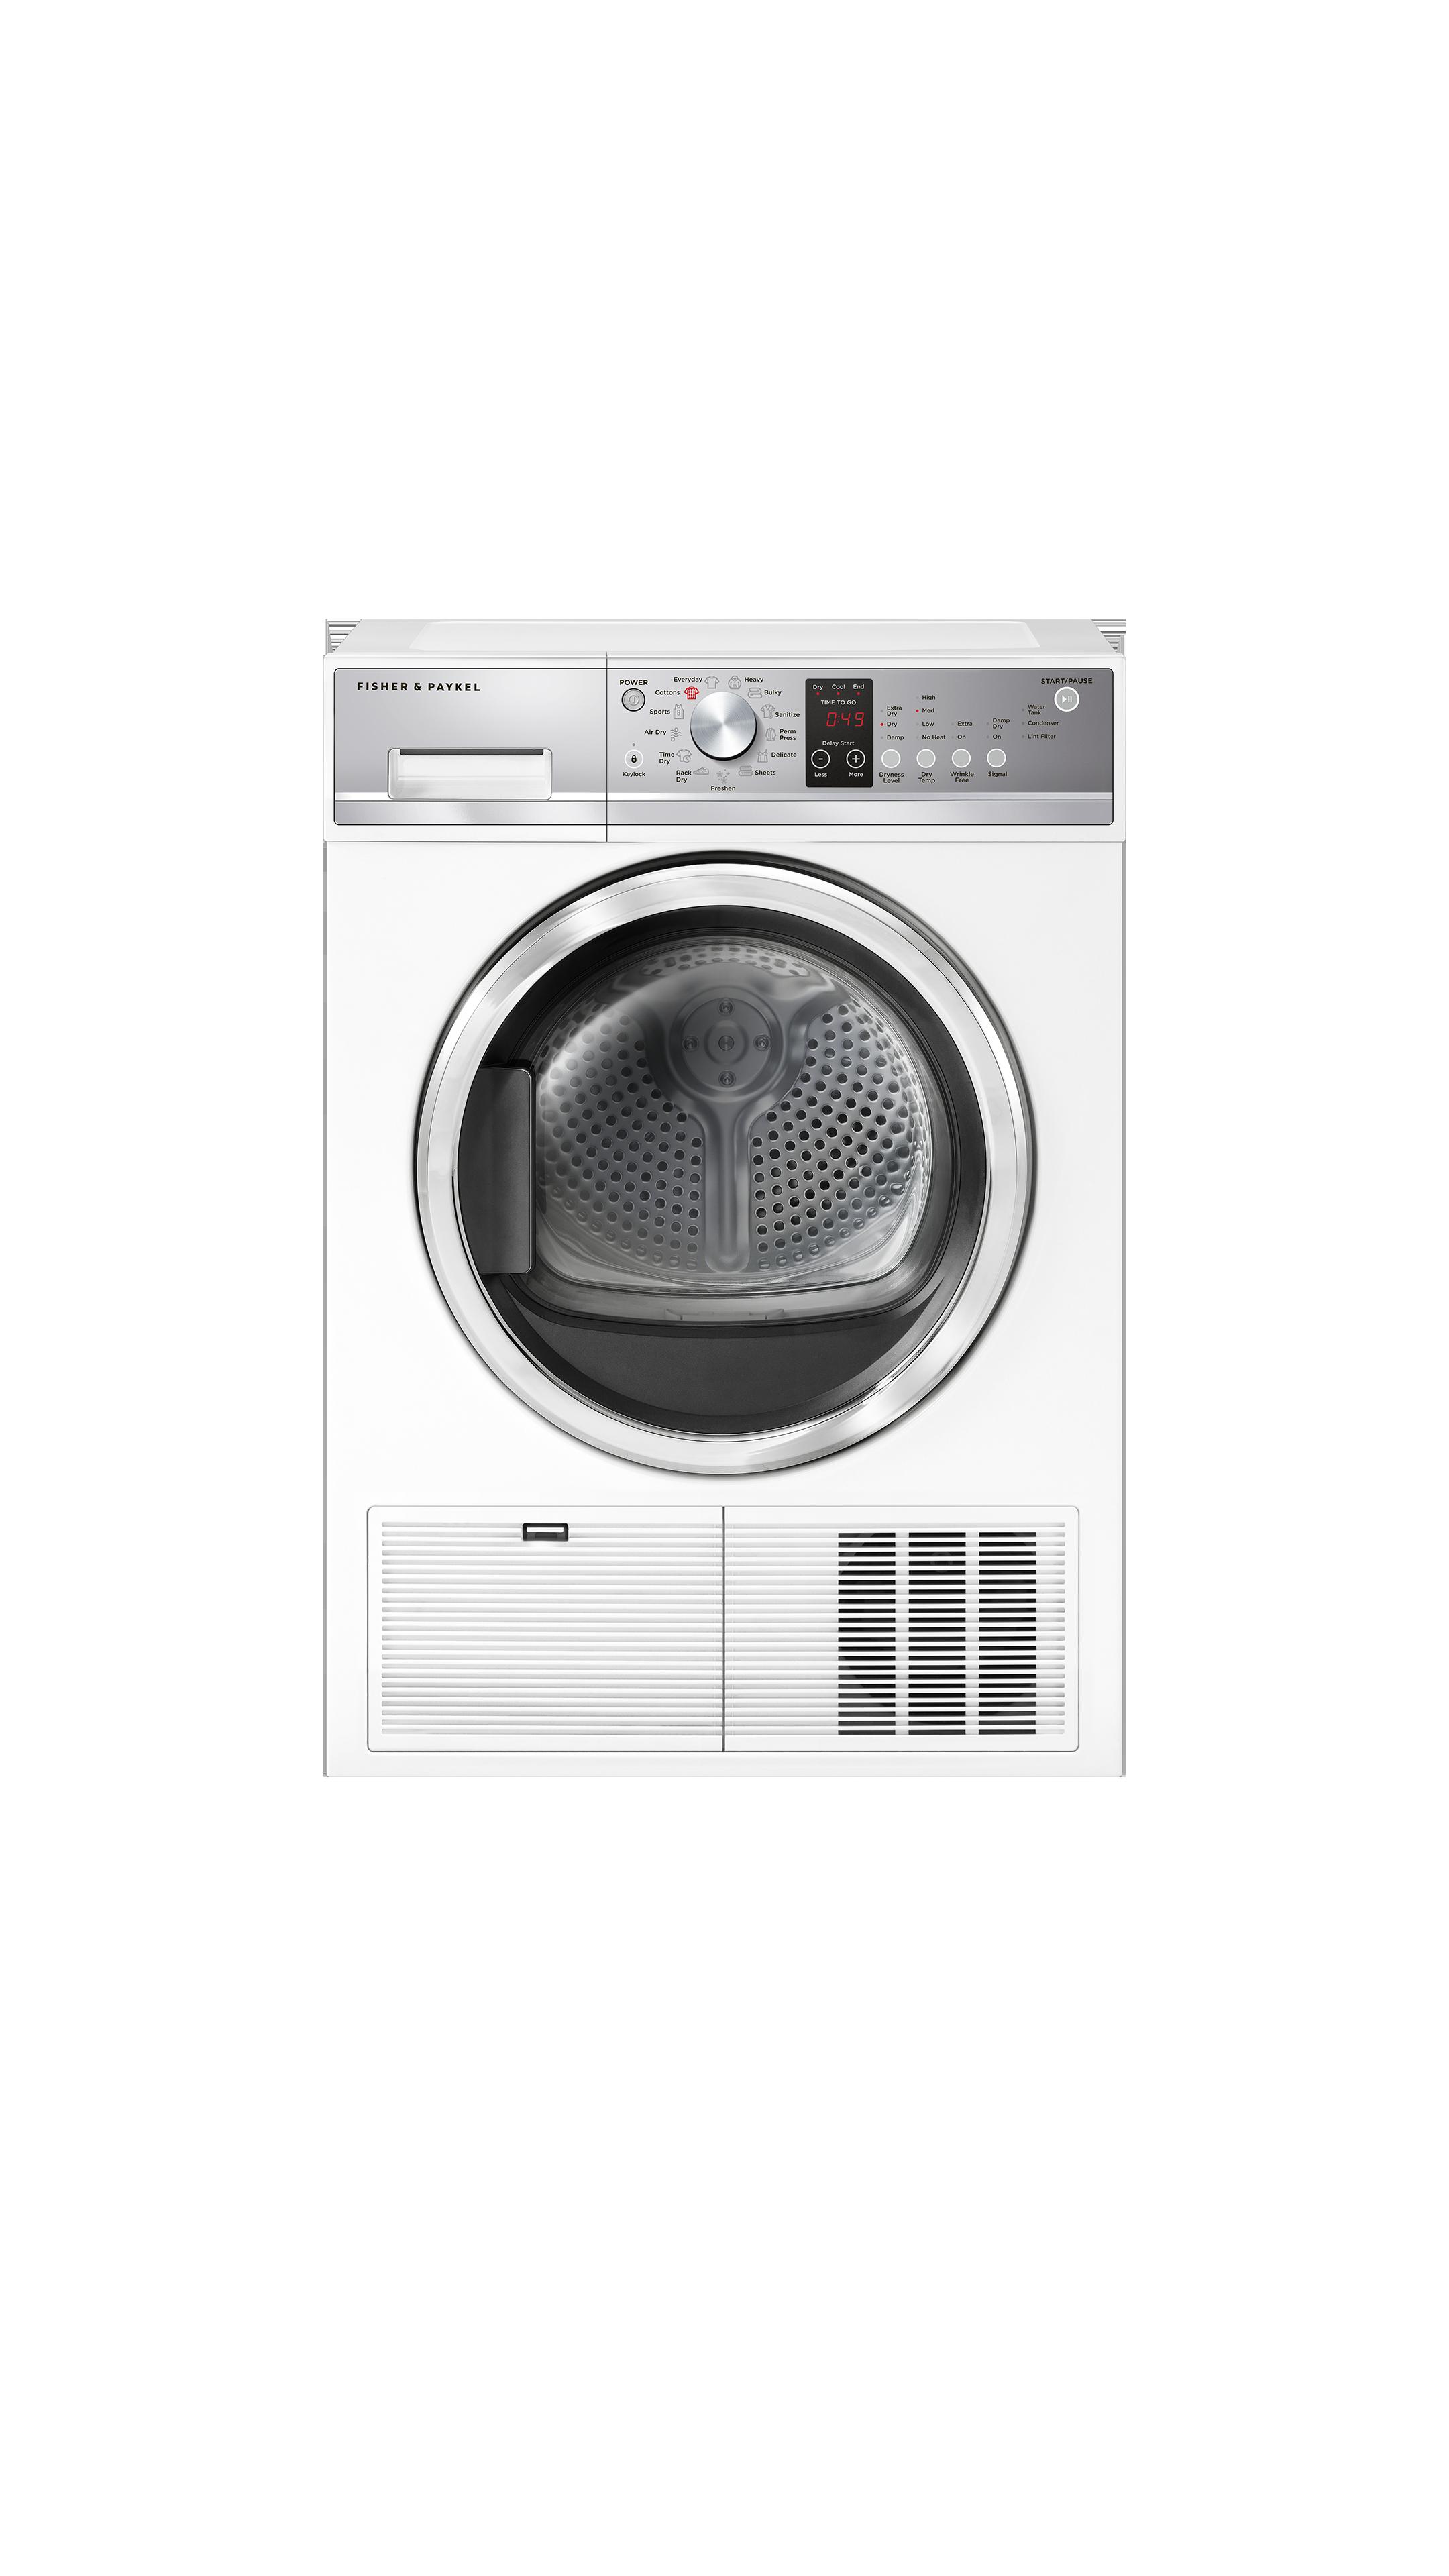 Model: DE4024P1   Fisher and Paykel Condensing dryer, 4.0 cu ft, Autosensing